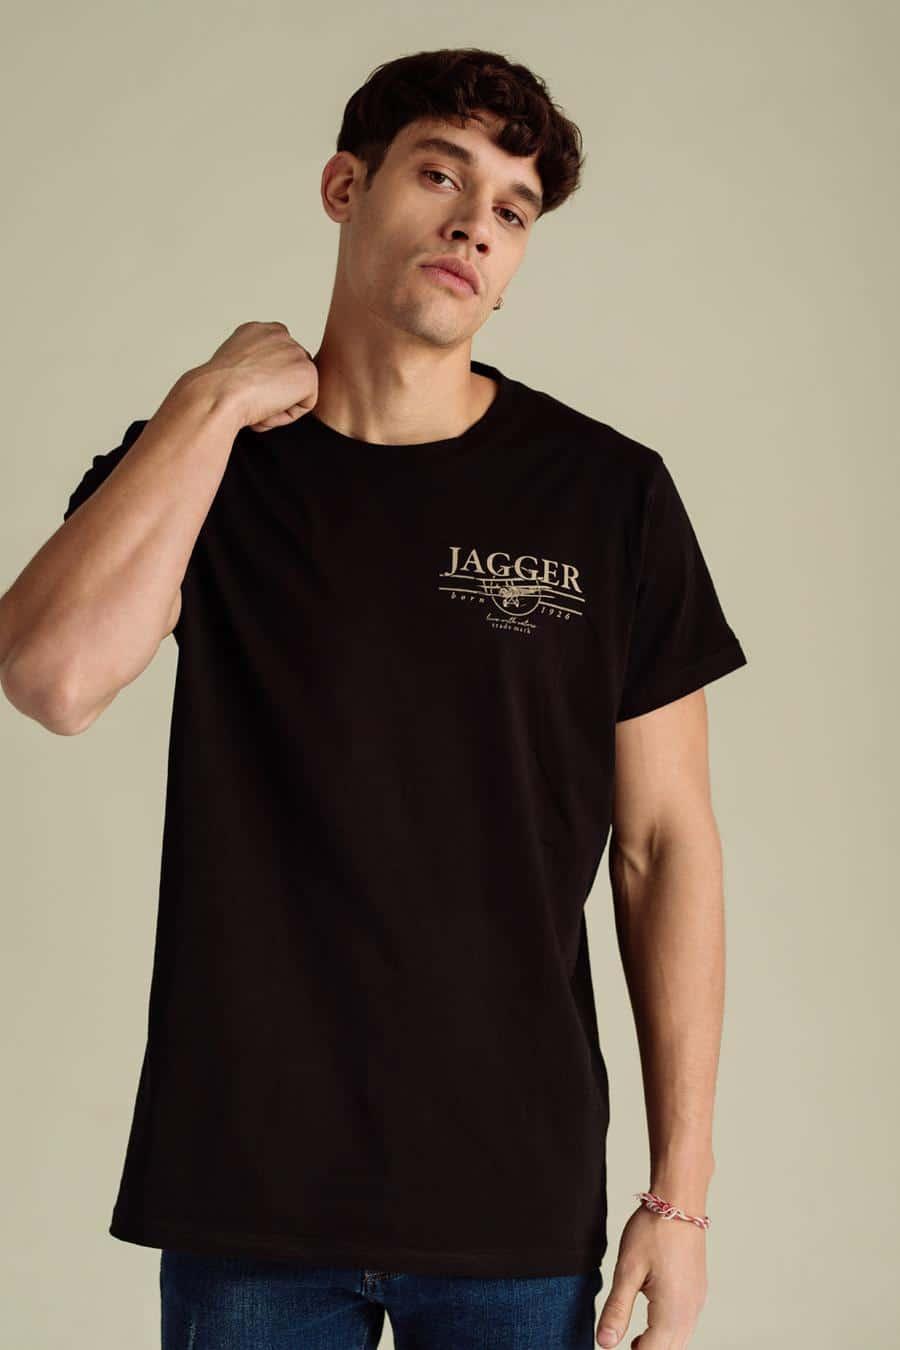 Jagger Muska Majica Kolekcija Prolece Leto Ss2021 Kupi Online Jm 3018 01 2